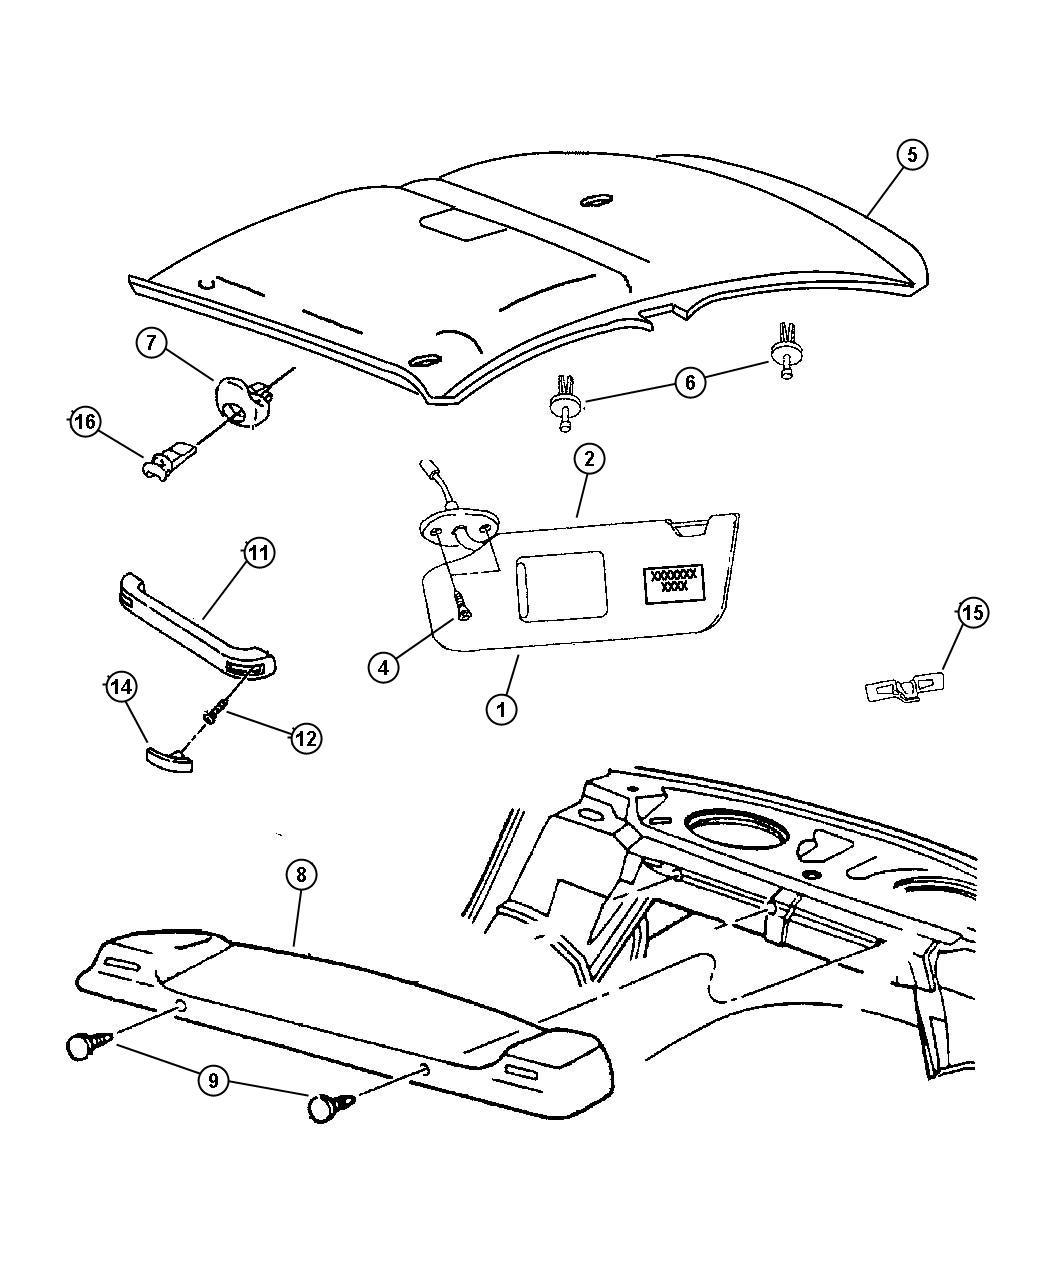 Chrysler Pacifica L Hybrid Screw Pan Head M6x1x20 Assist Handles Body